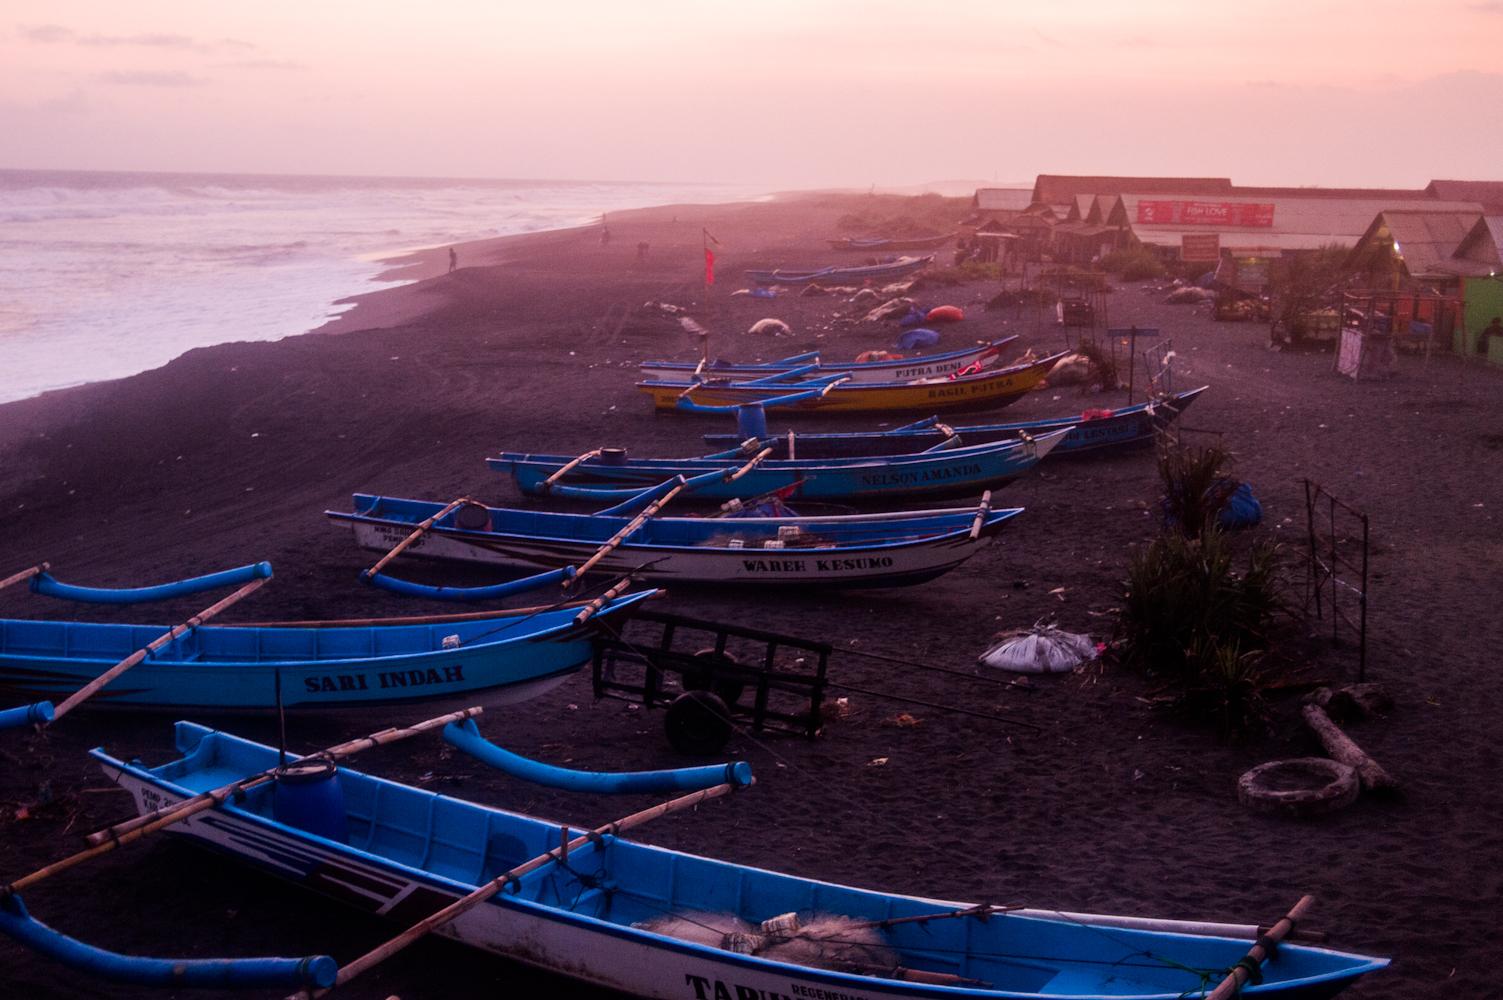 20120617_KEVINMICHAELBRIGGS_indonesia_001-4.jpg